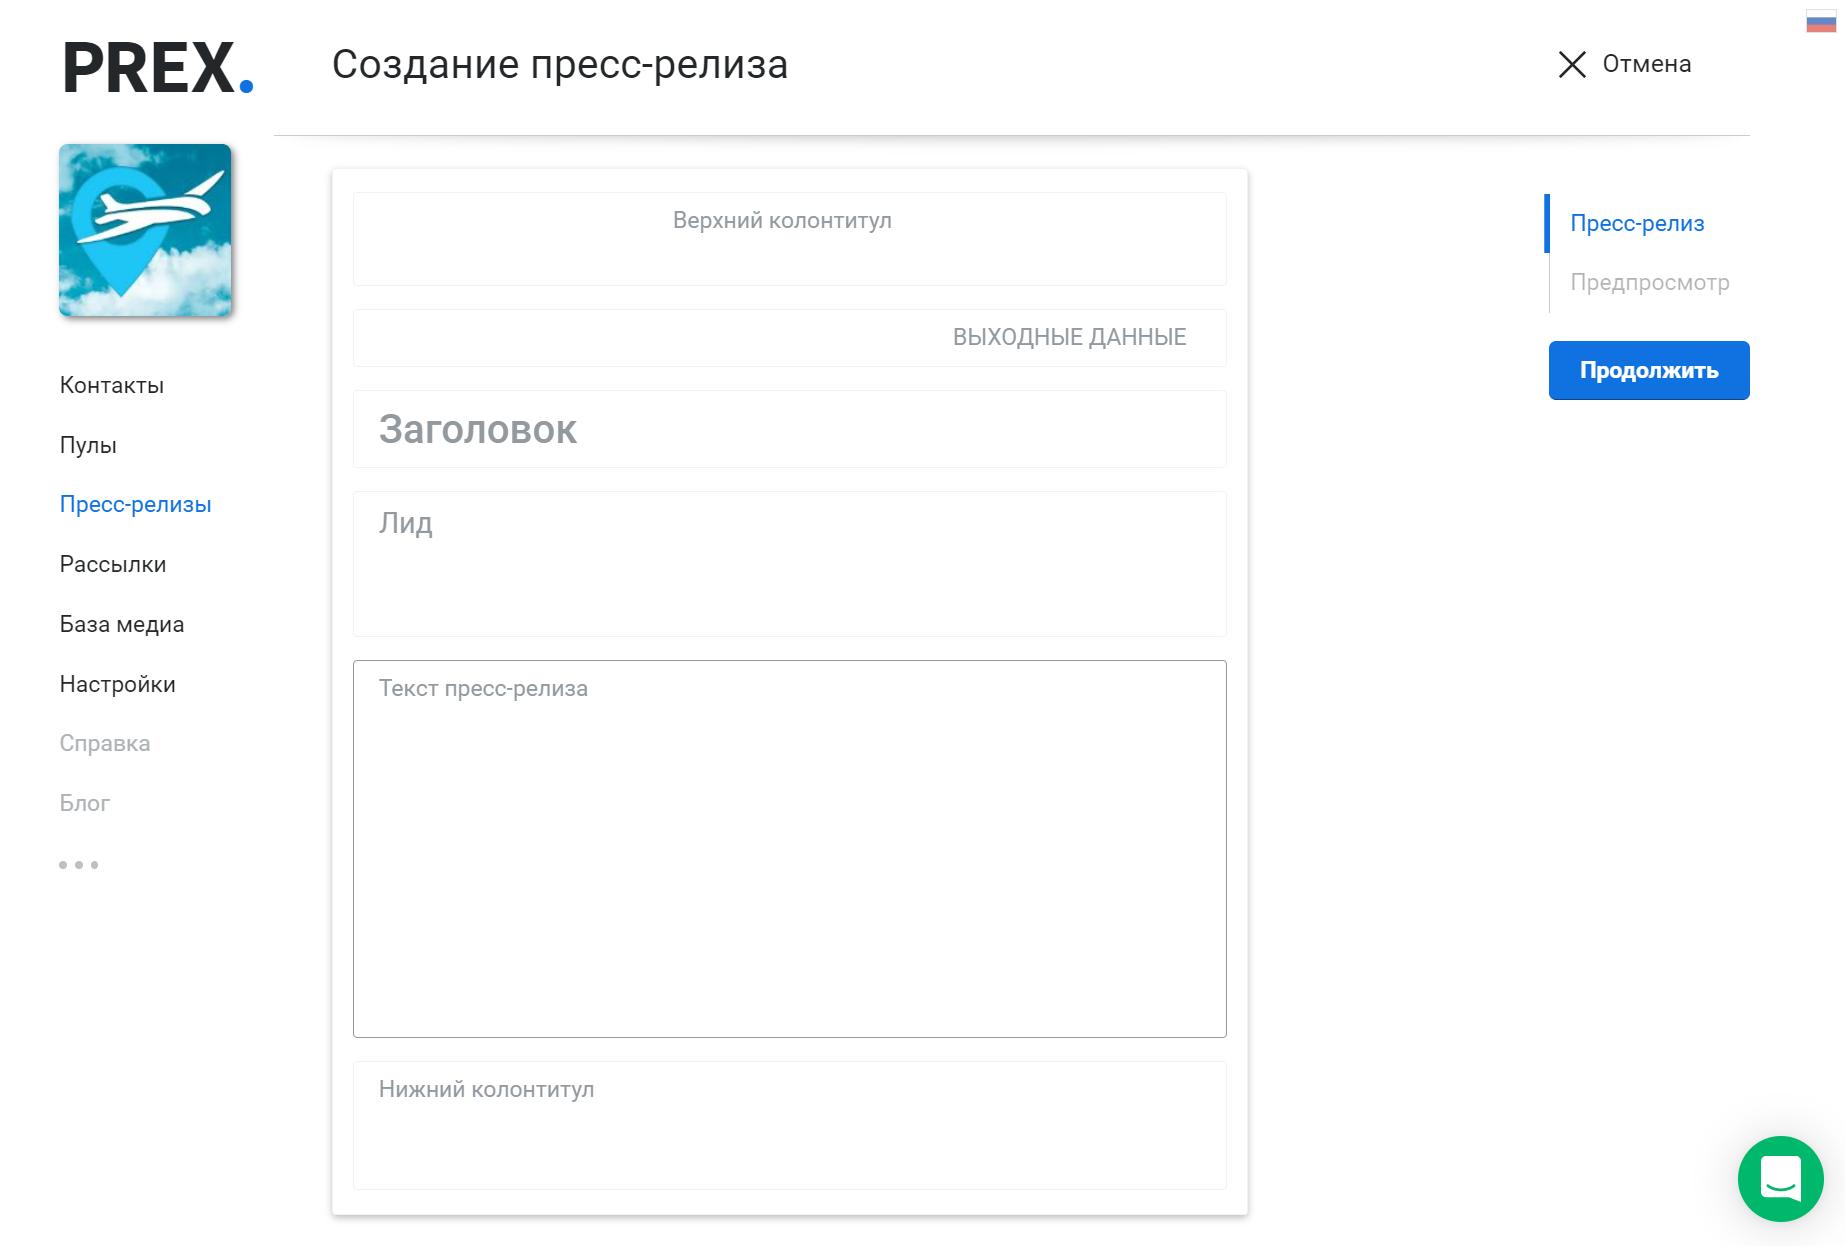 Редактор пресс-релиза в PREX